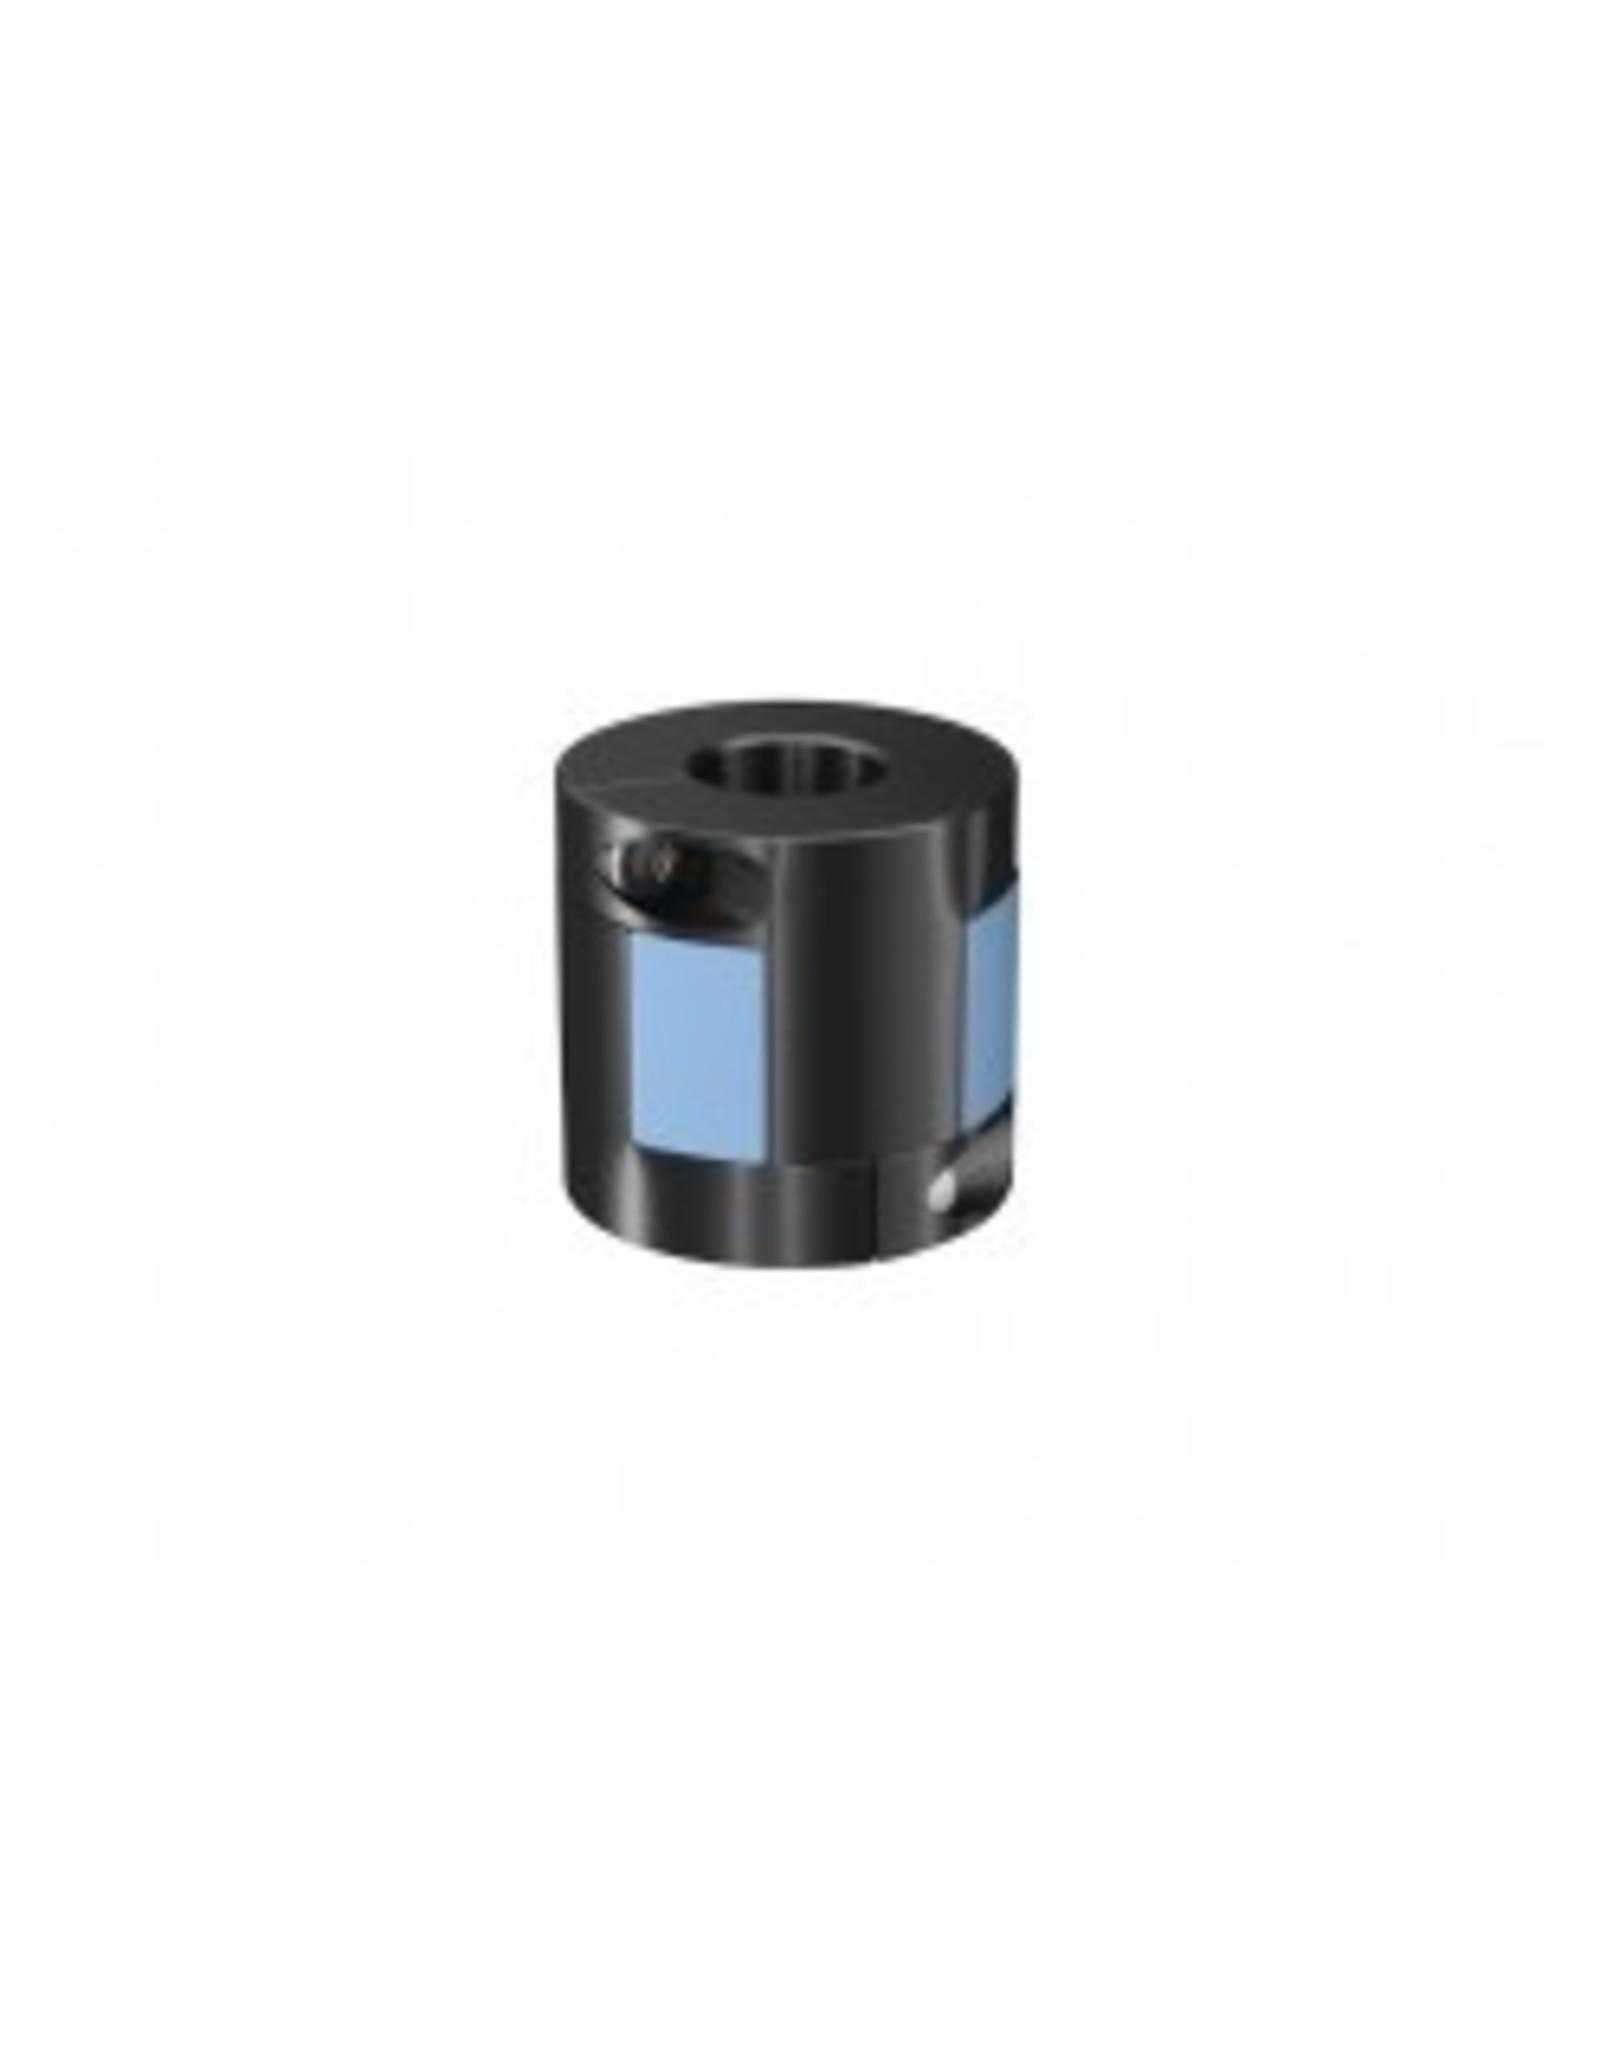 Zortrax Zortrax M200 / M300 Z-koppeling